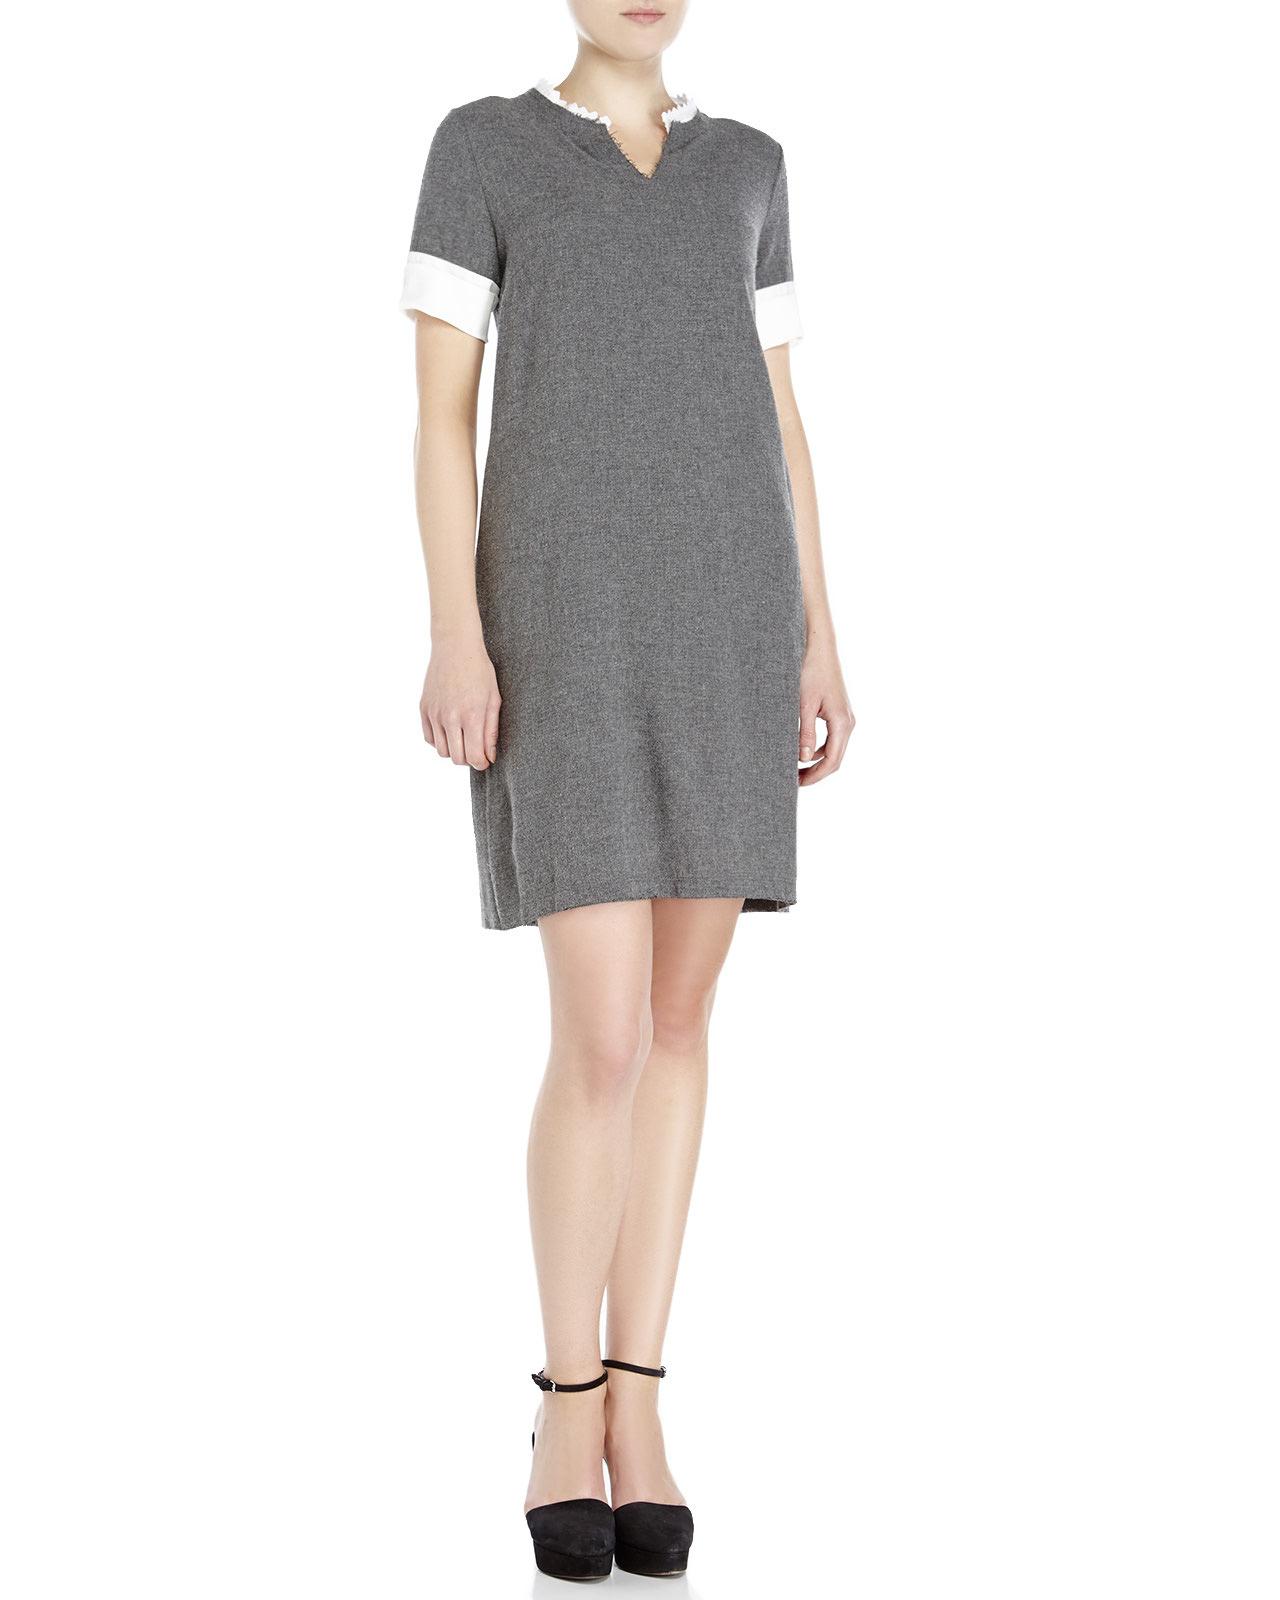 Century 21 ottod 39 ame split v neck dress in gray grey lyst for Century 21 dress shirts